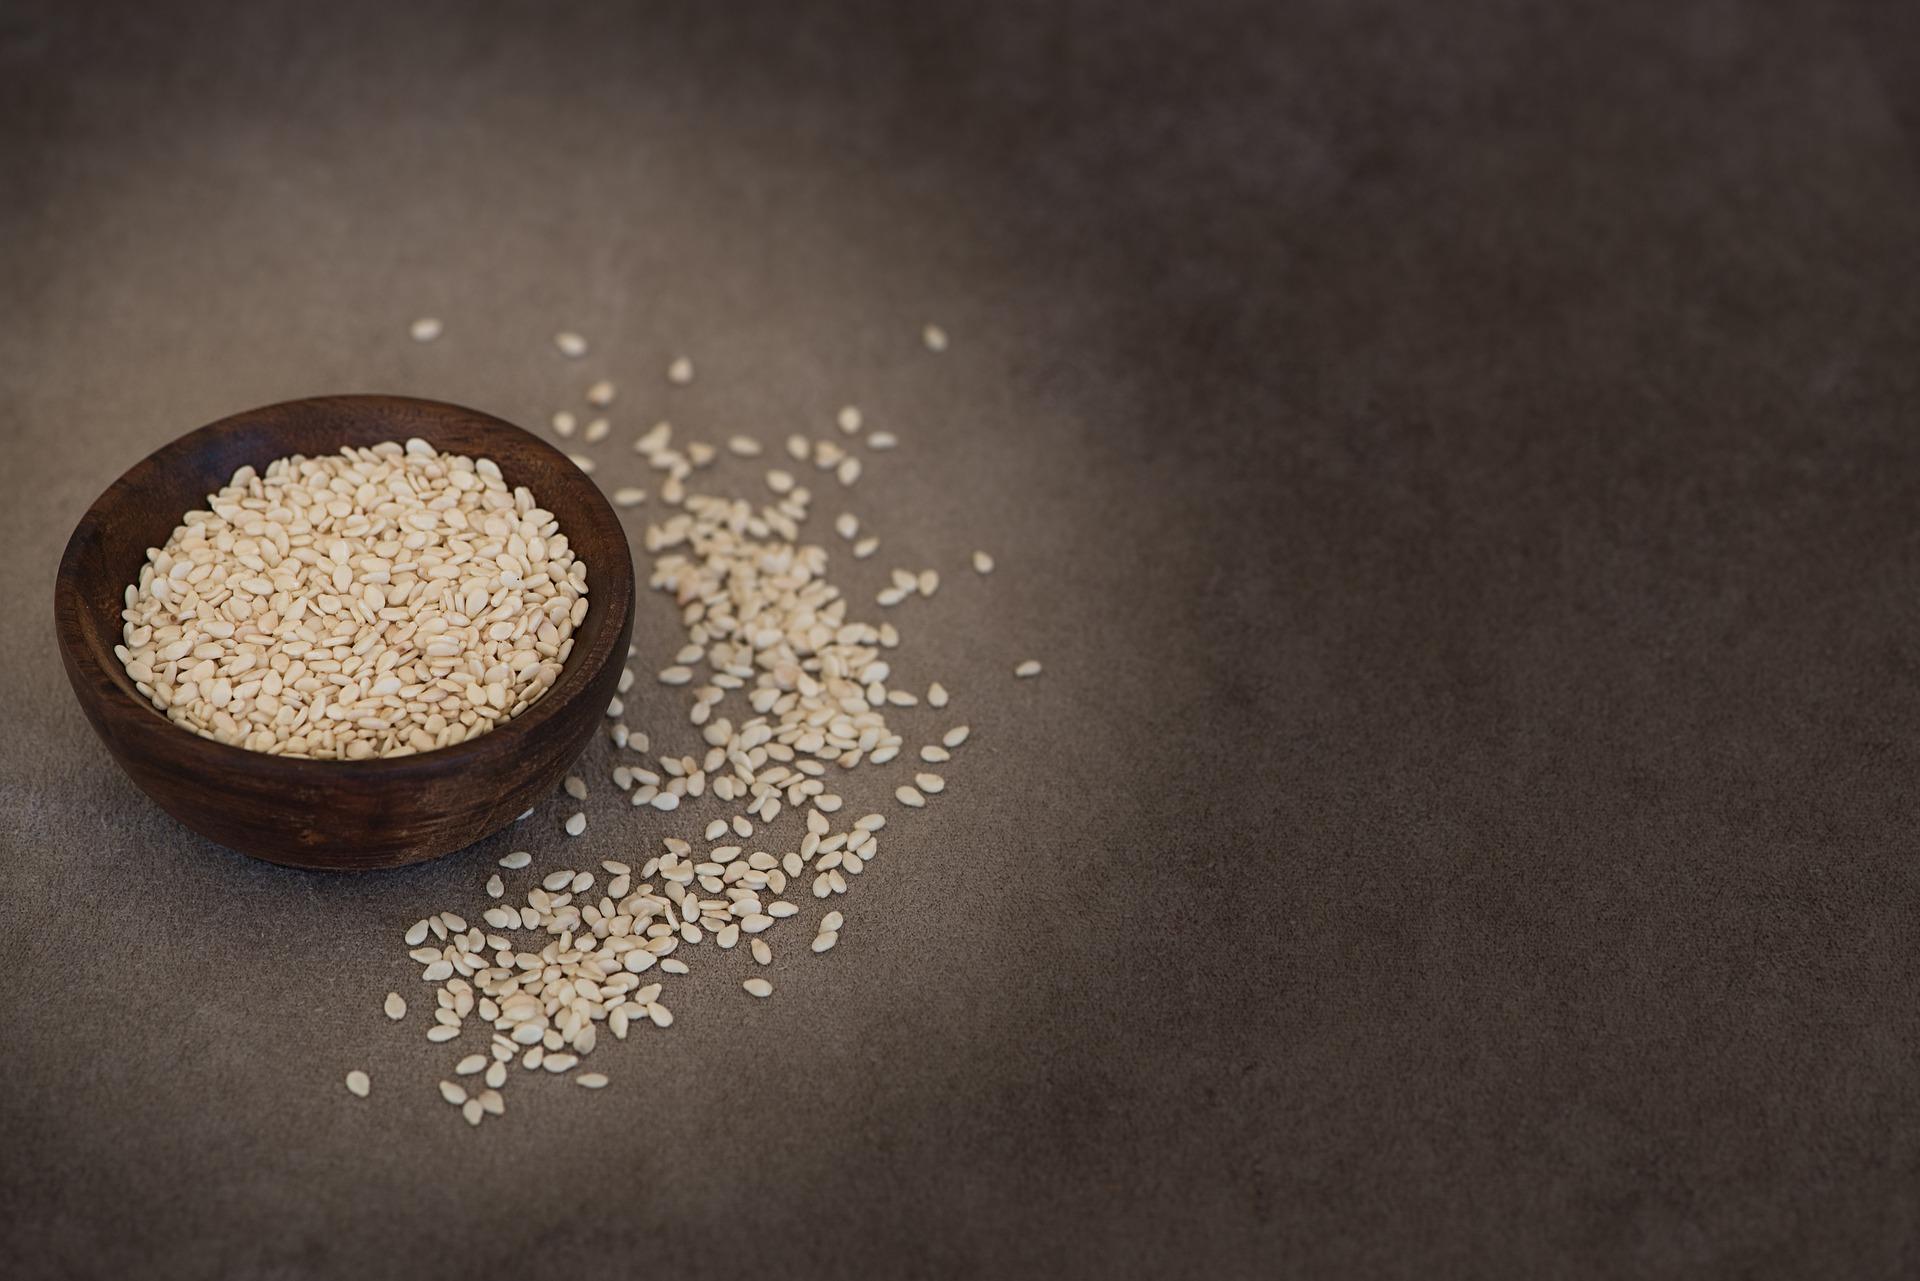 benne seeds